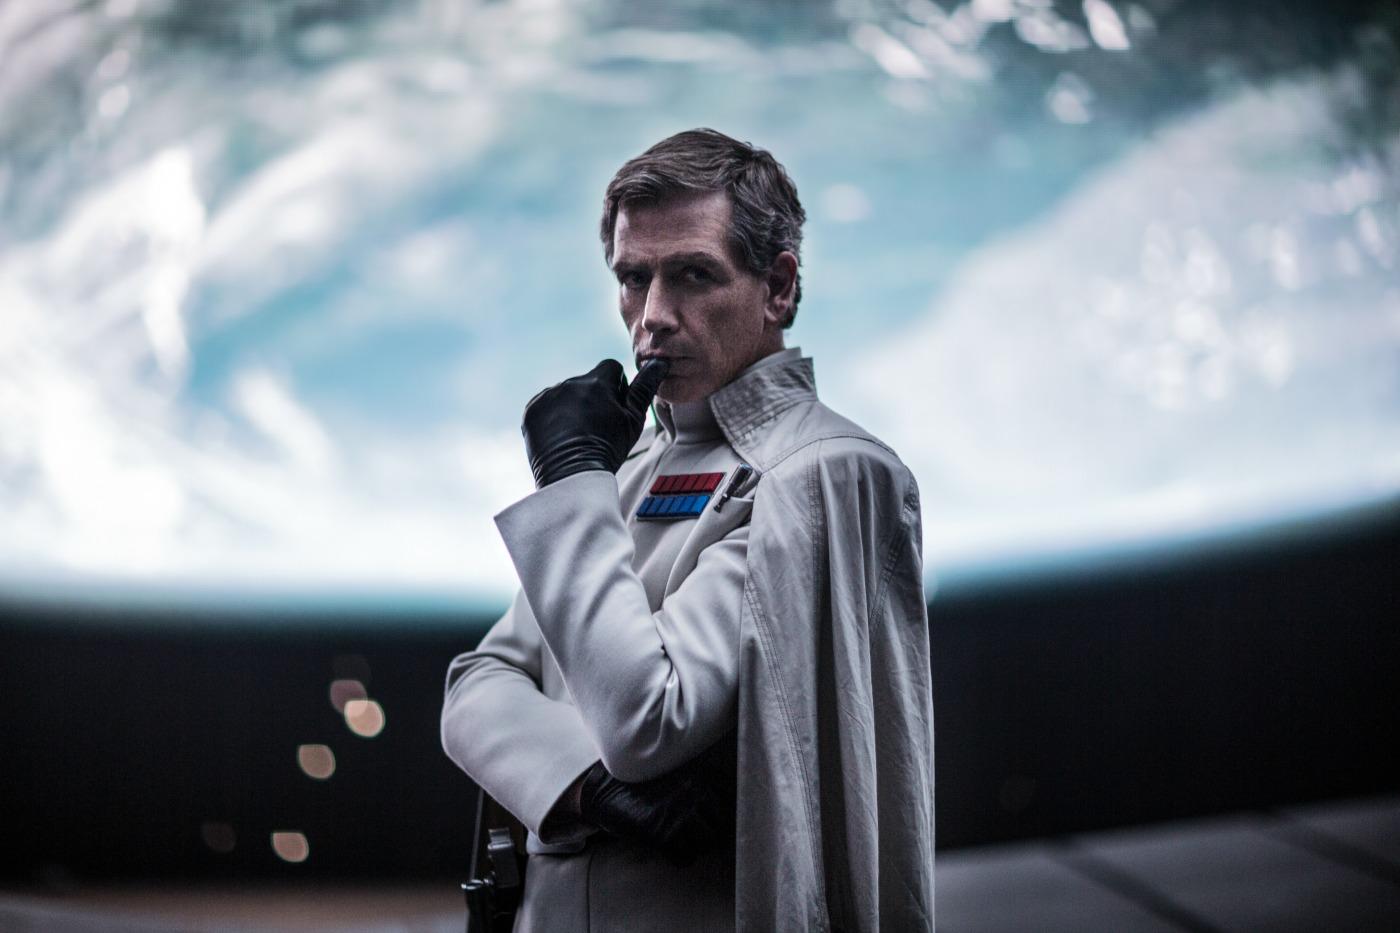 Ben Mendelshon as Orson Krennic on Rogue One: A Star Wars Story - mamalatinatips.com